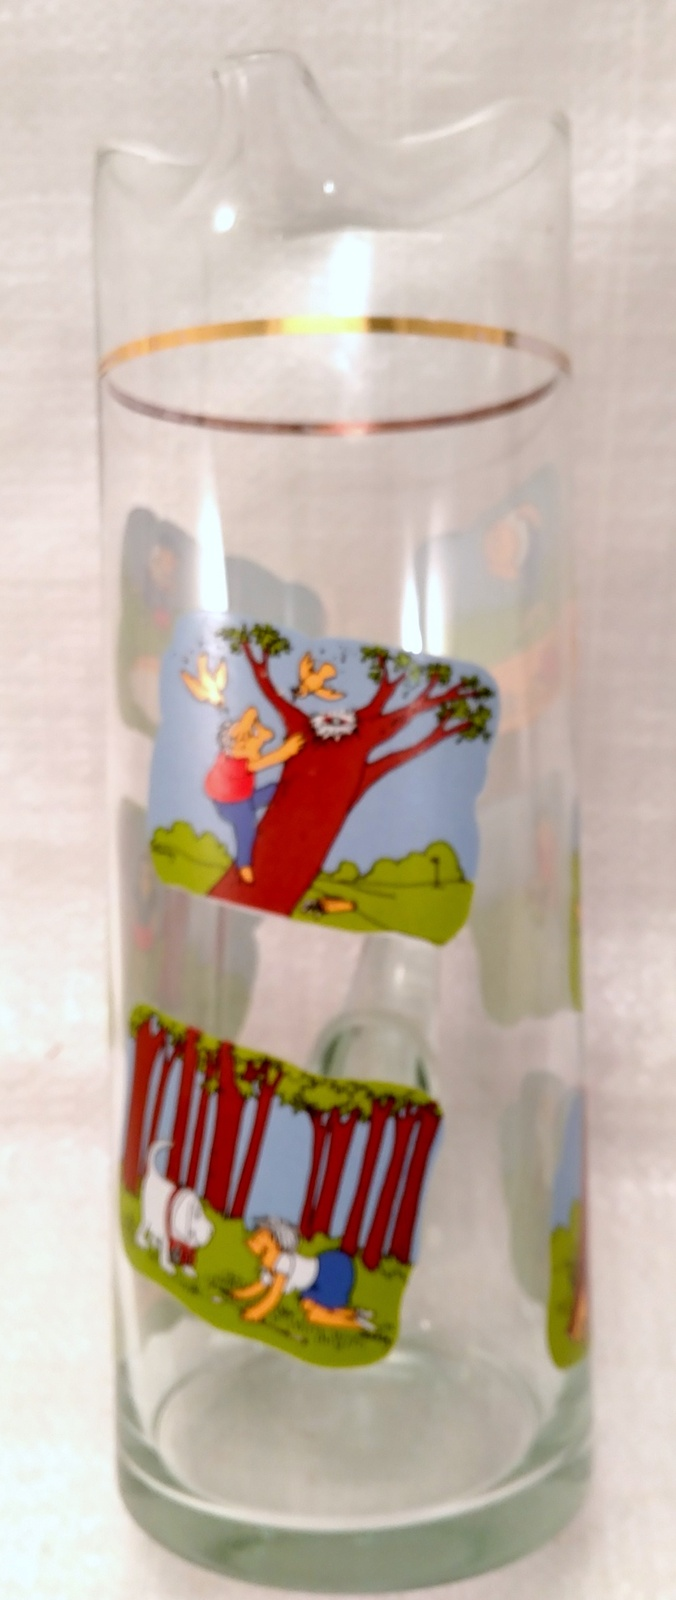 Golfer Martini Pitcher Glass Beaker Style Barware - Ashby Golf Cartoon